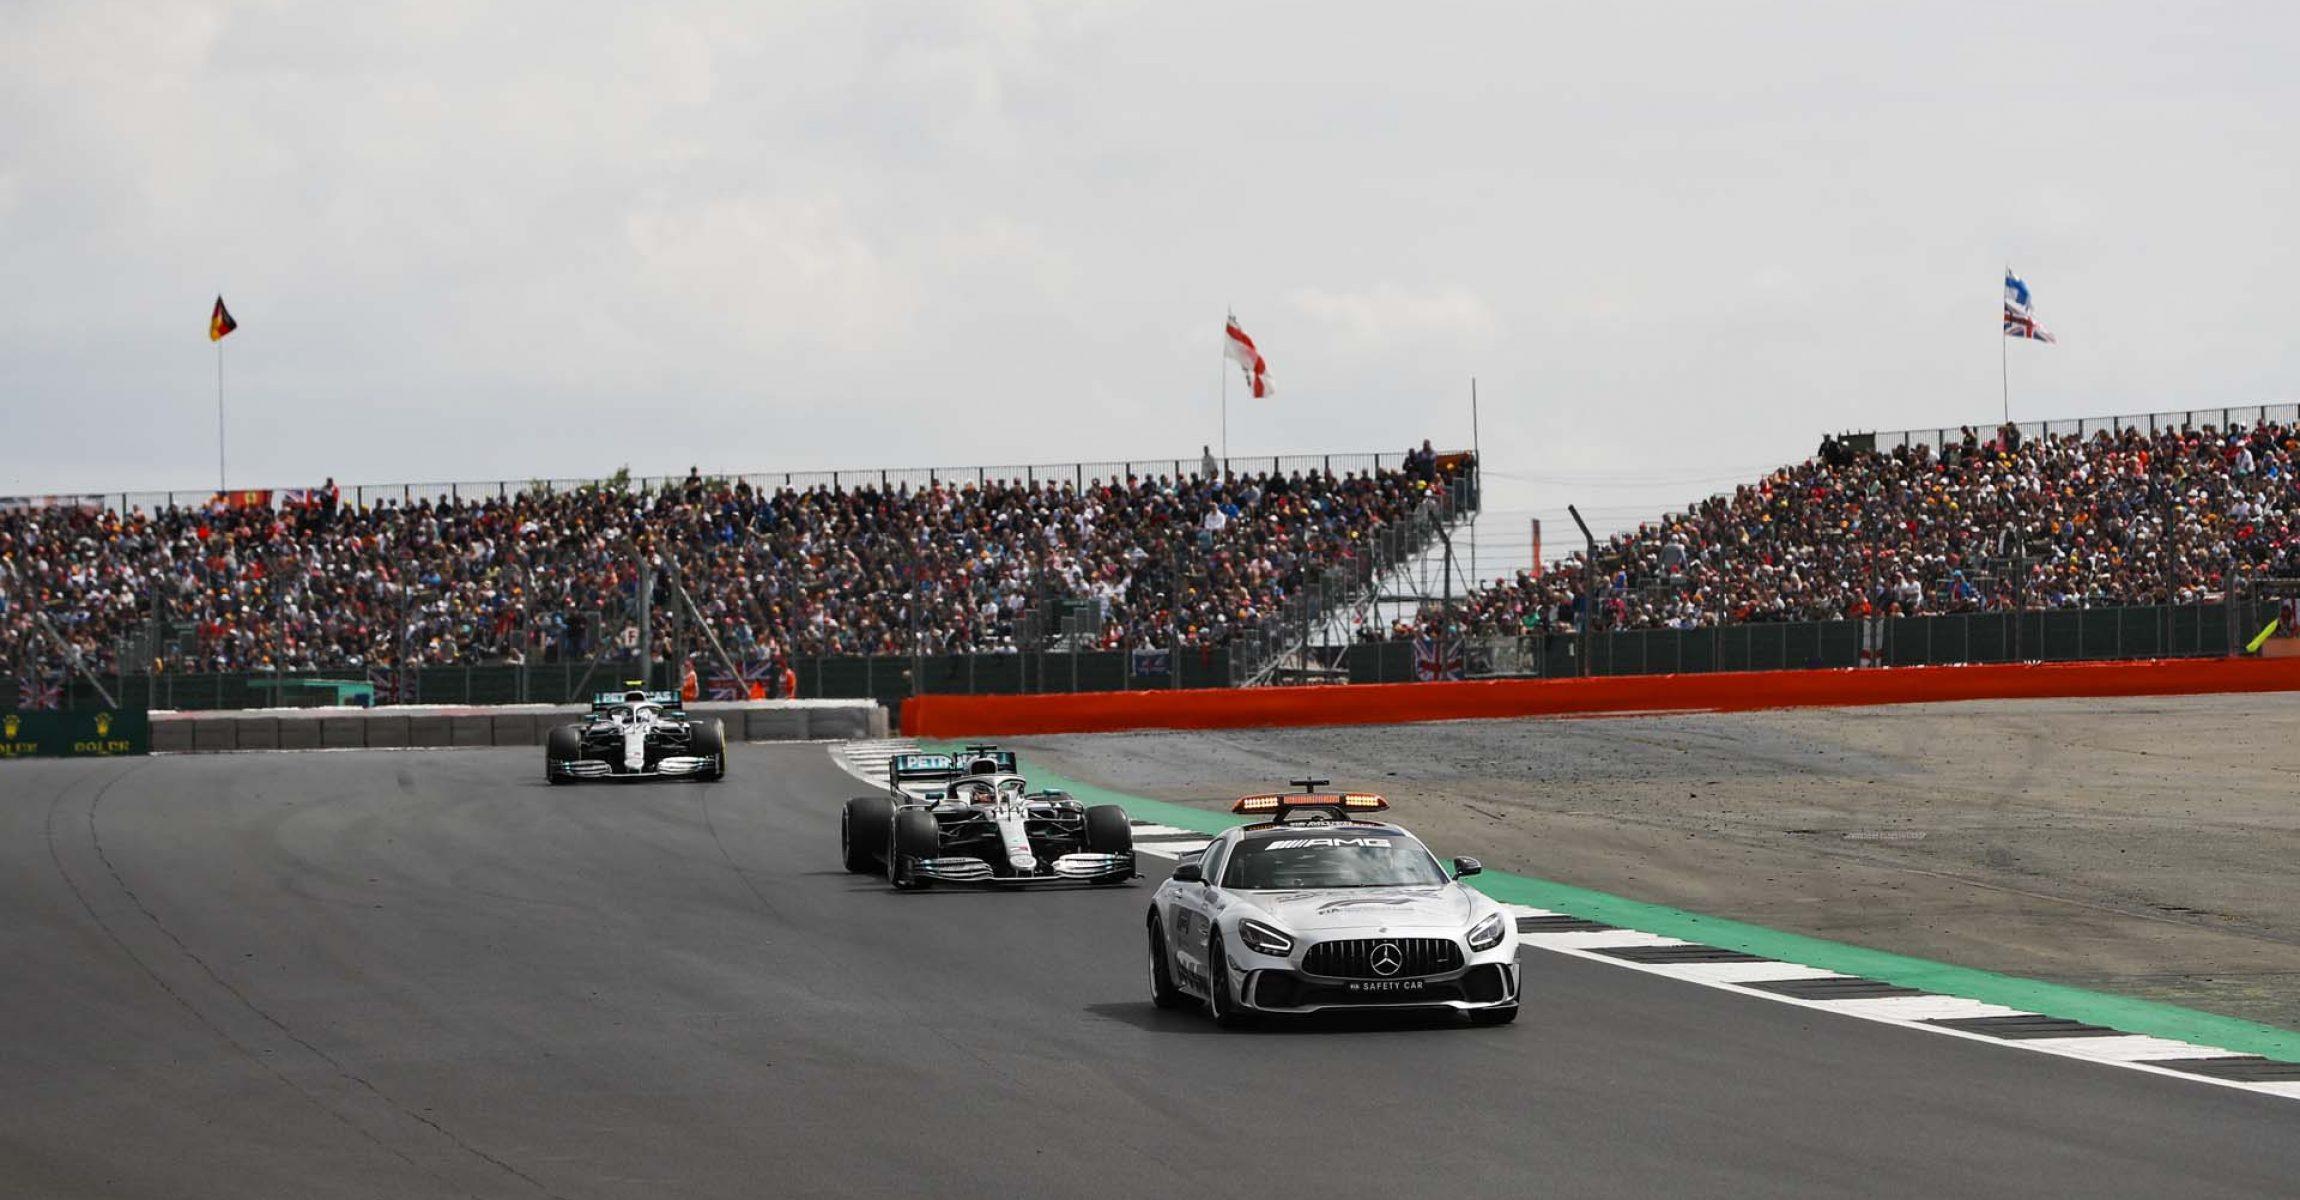 2019 British Grand Prix, Sunday - LAT Images safety Car, Bernd Mayländer Lewis Hamilton Mercedes